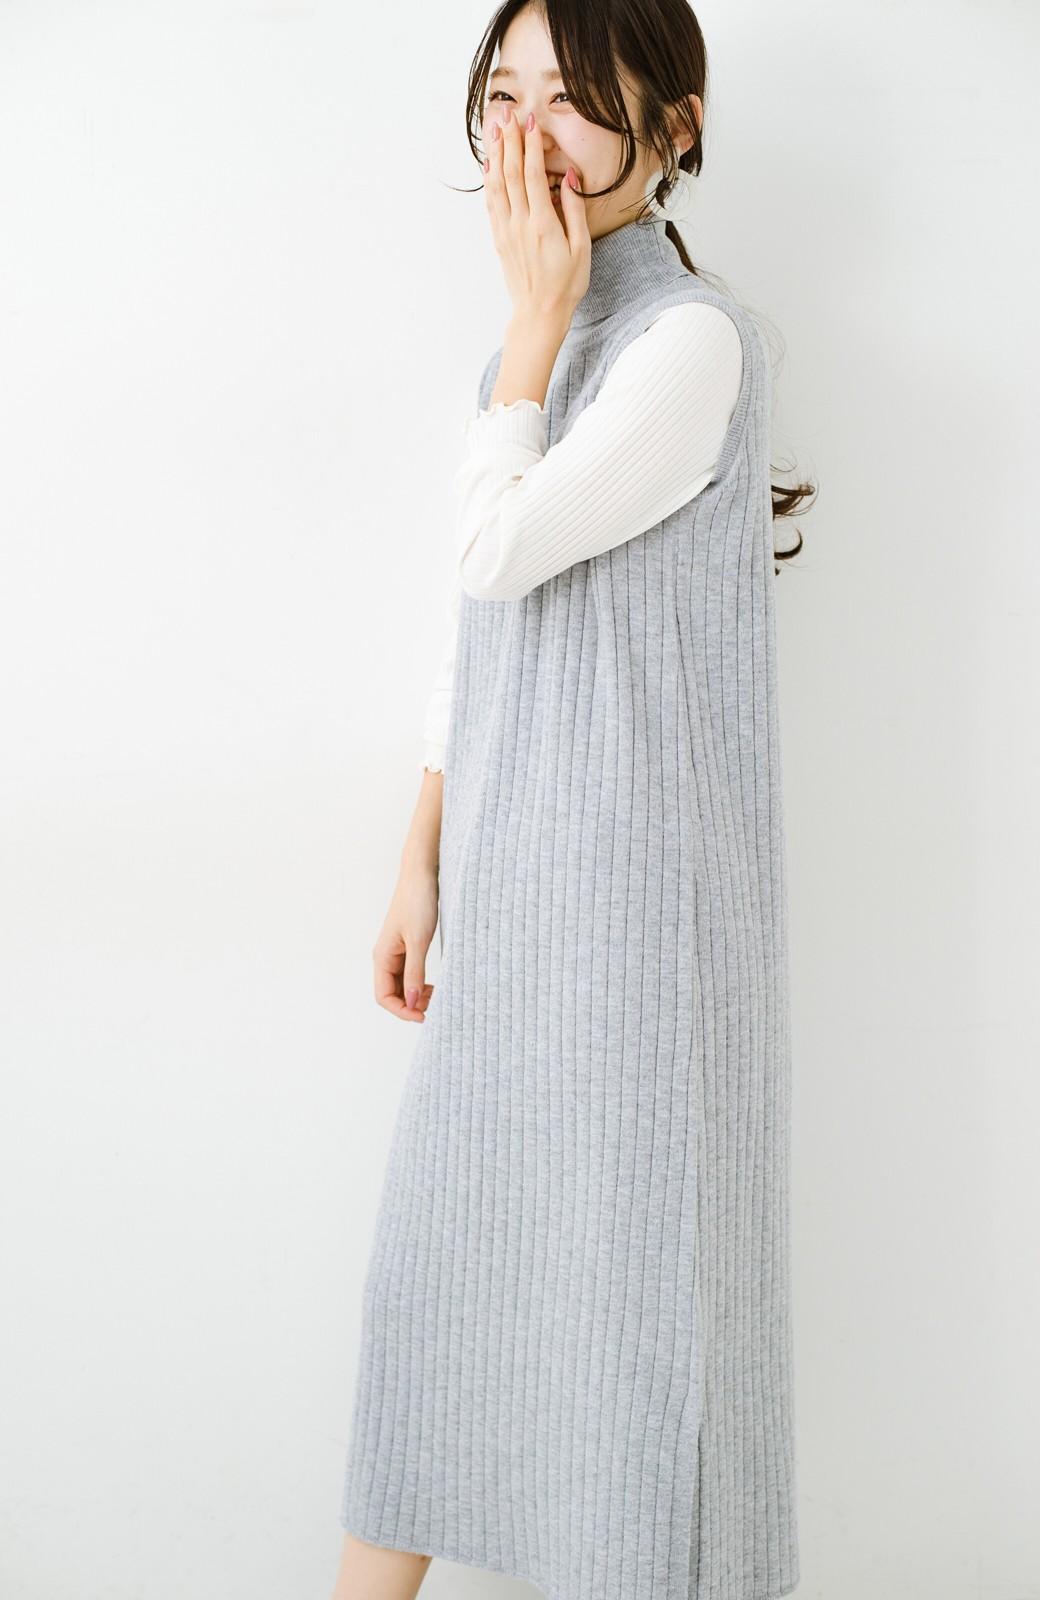 haco! セットで着るだけパッとかわいい ニットトップス&ノースリーブニットワンピースセット <グレー>の商品写真20